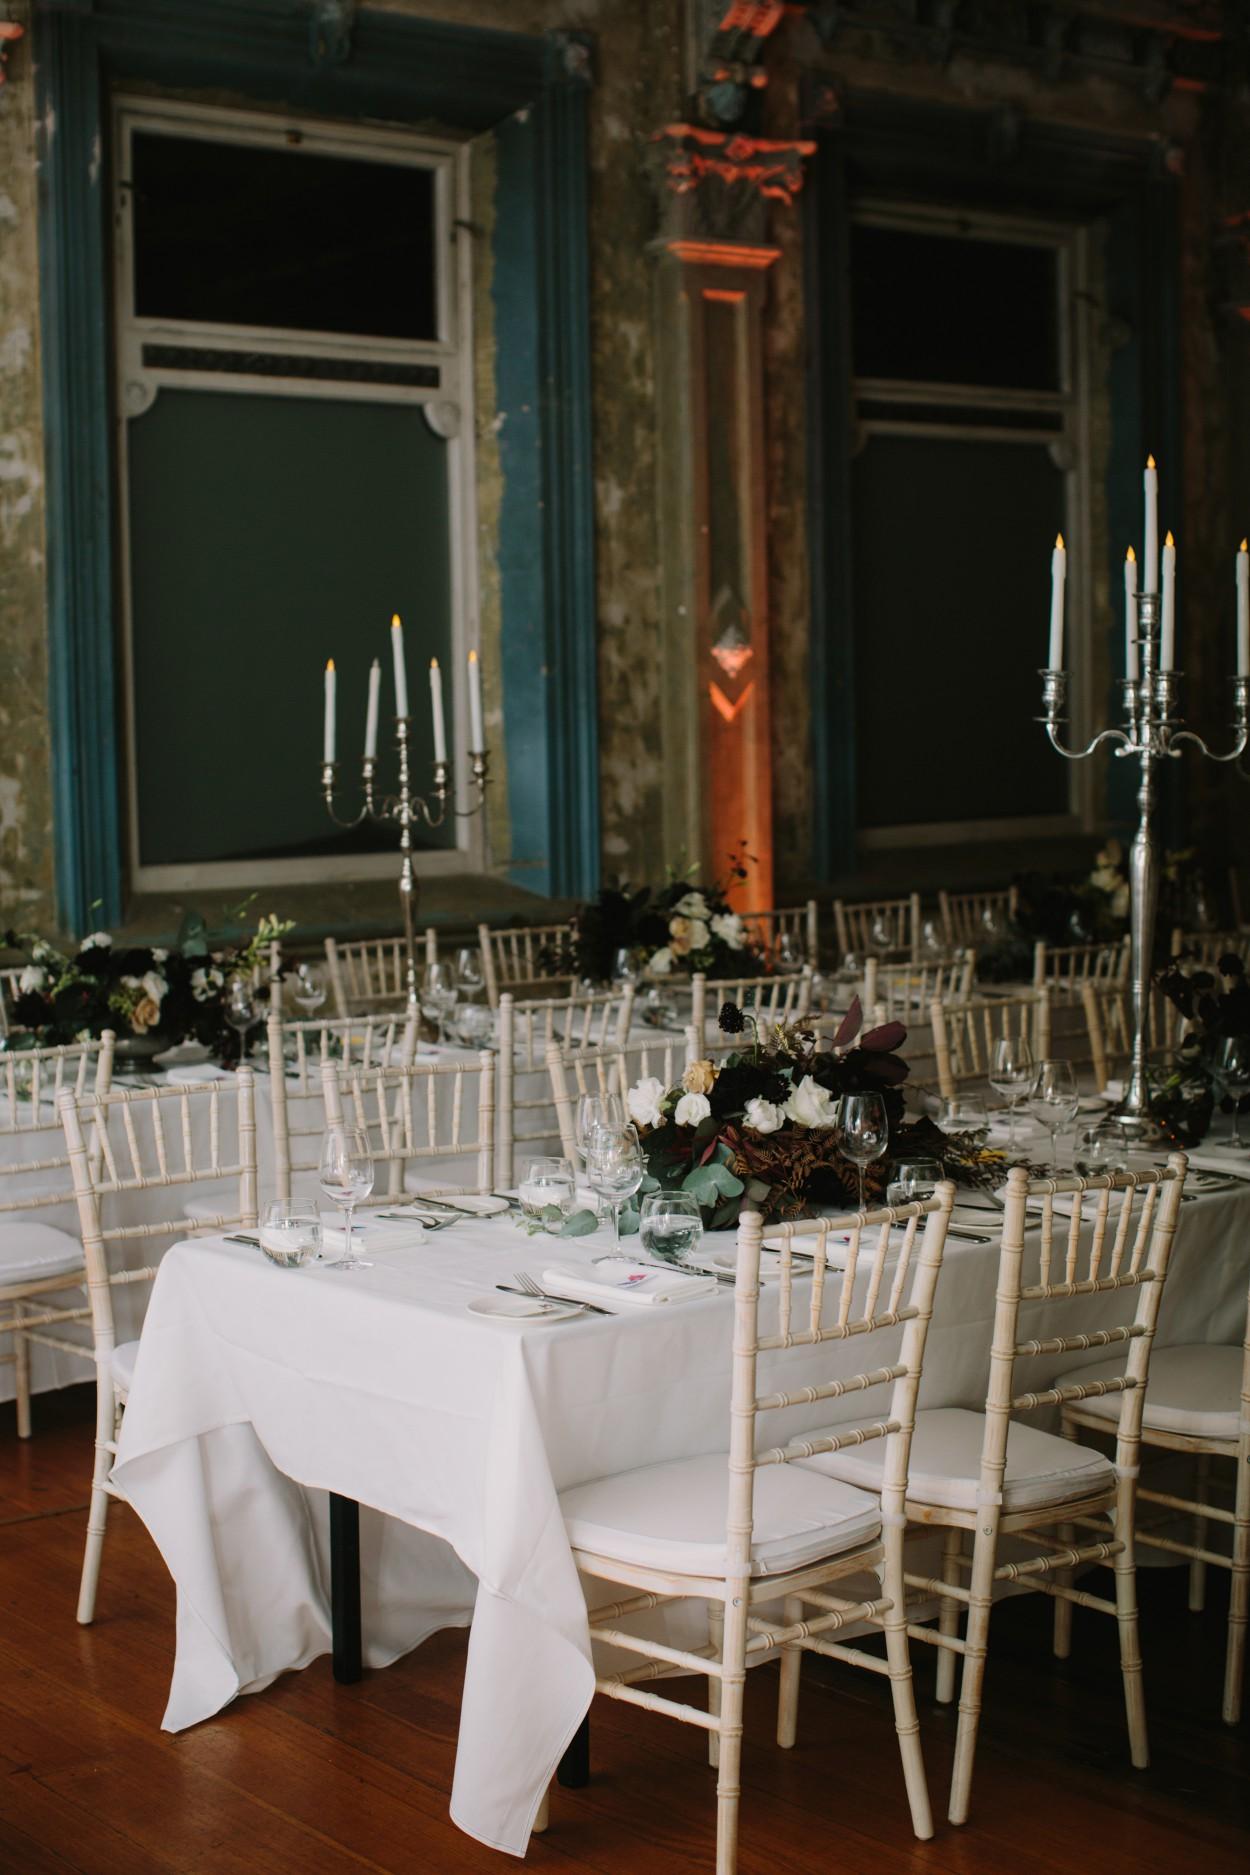 I-Got-You-Babe-Weddings-The-099George-Ballroom-St-Kilda-Wedding-Amy-Abhi.jpg